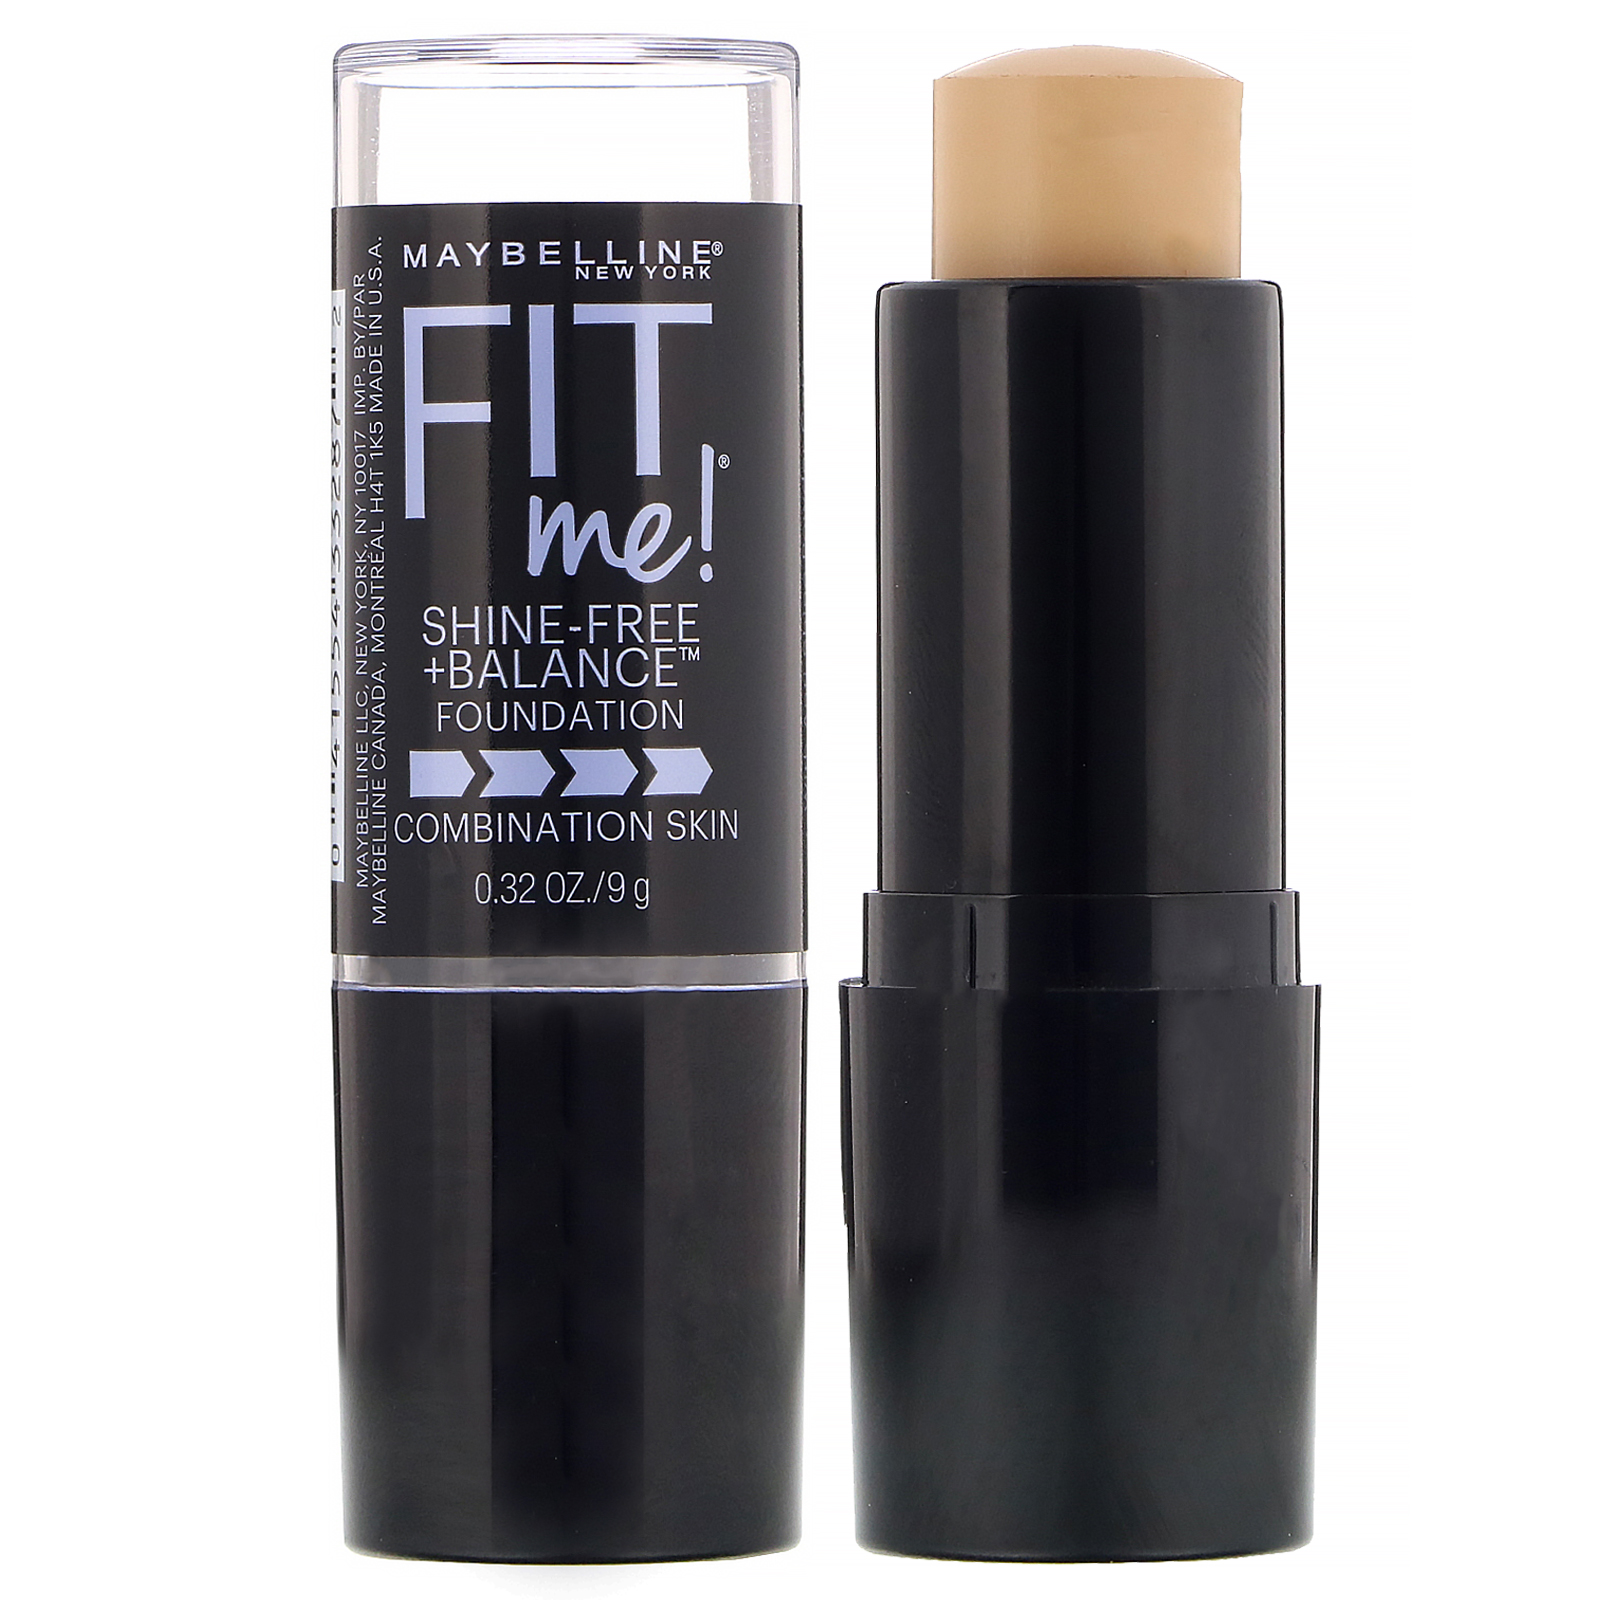 Maybelline Fit Me Shine Free Balance Stick Foundation 220 Natural Beige 0 32 Oz 9 G Iherb